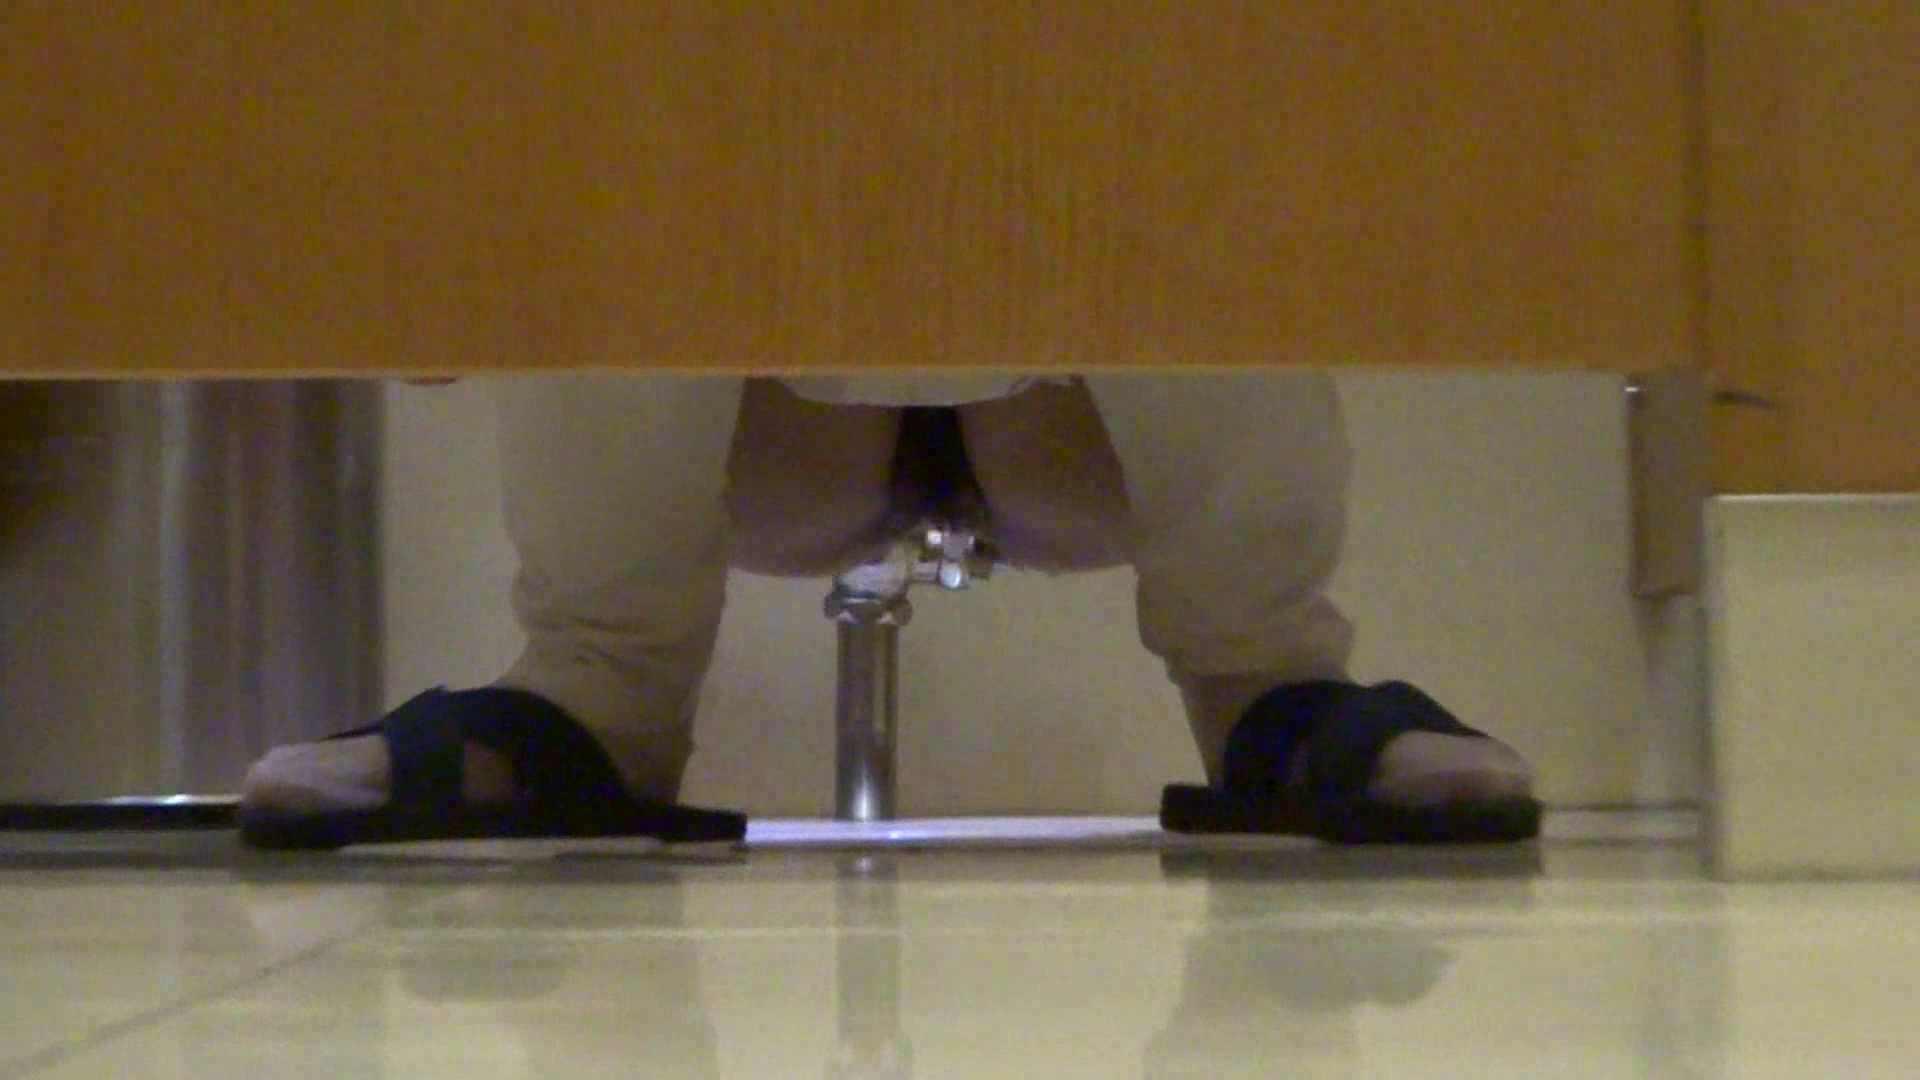 隣国化粧室下から御免!! No.15 洗面所 | 美女H映像  103画像 4